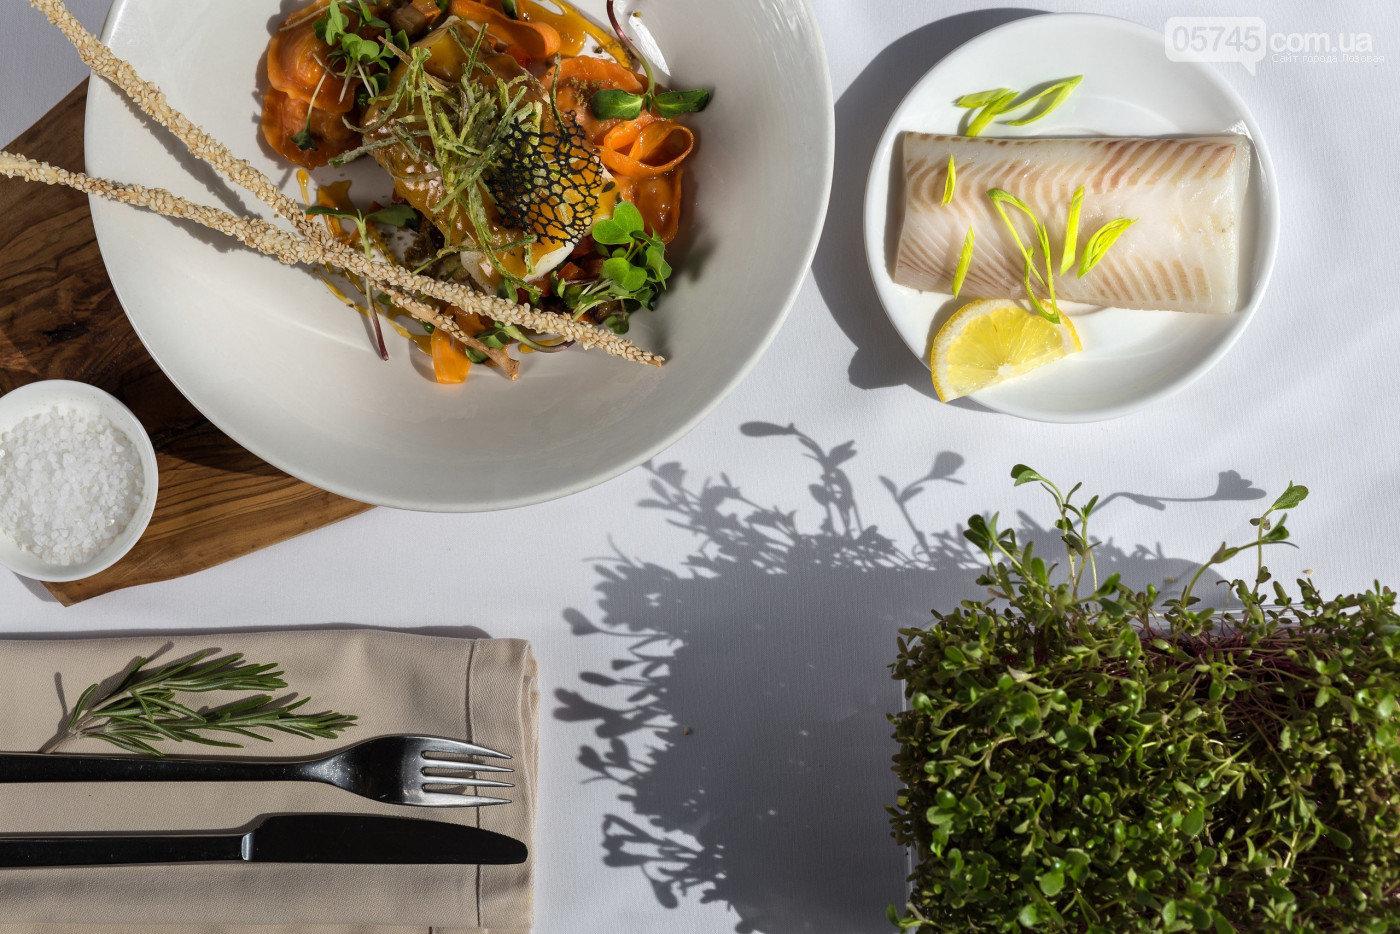 Вкусно, красиво, полезно: лозовчанка Елена Балахнина выращивает микрозелень, фото-5